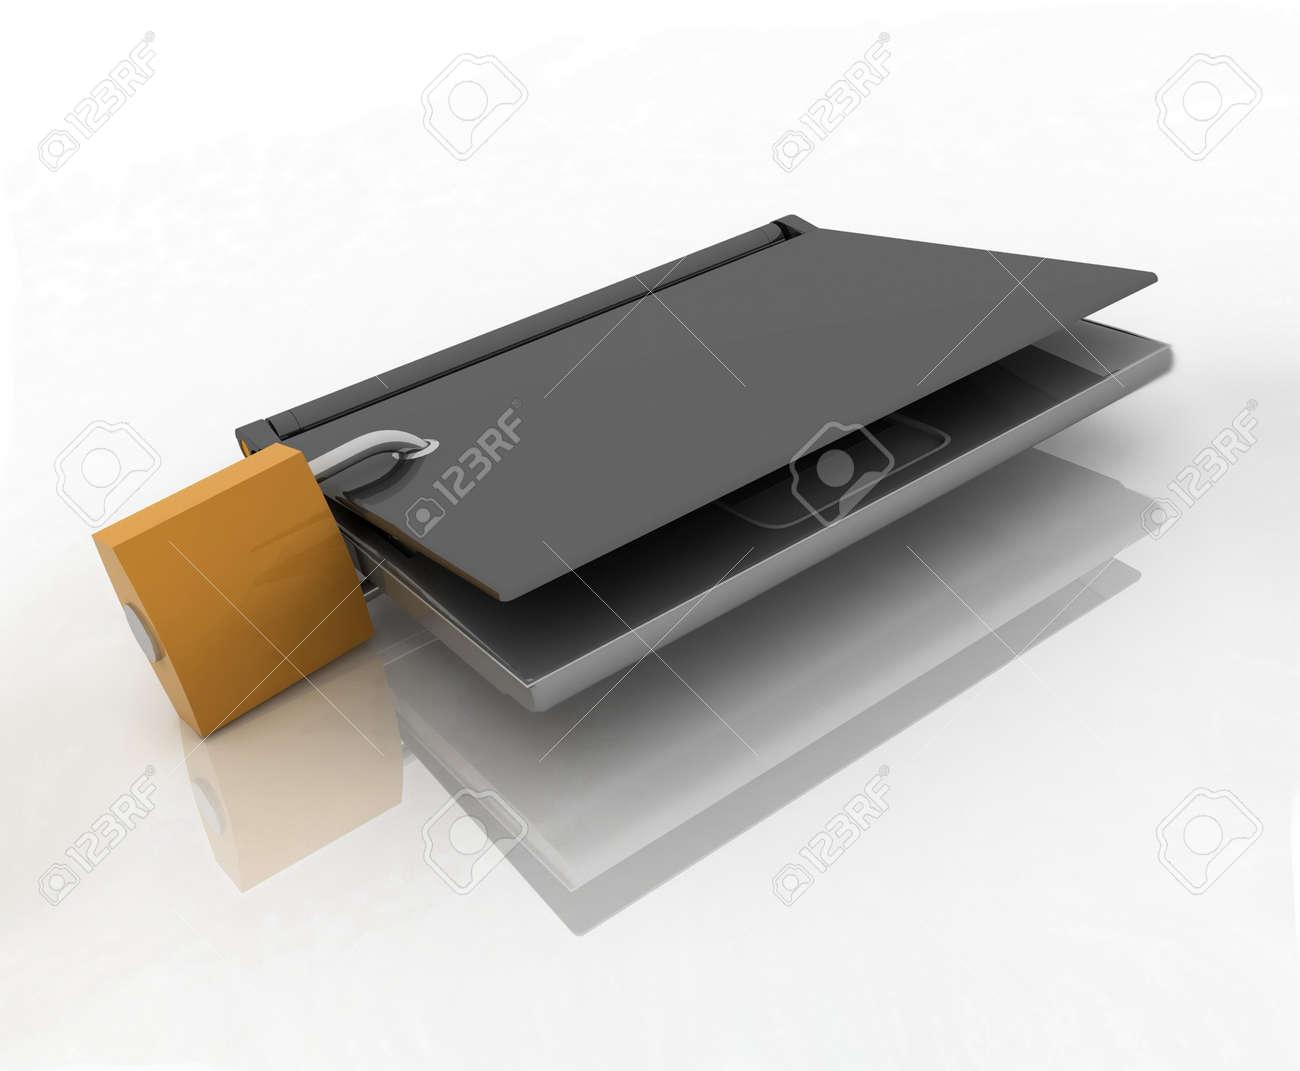 laptop closed on the lock Stock Photo - 12588336